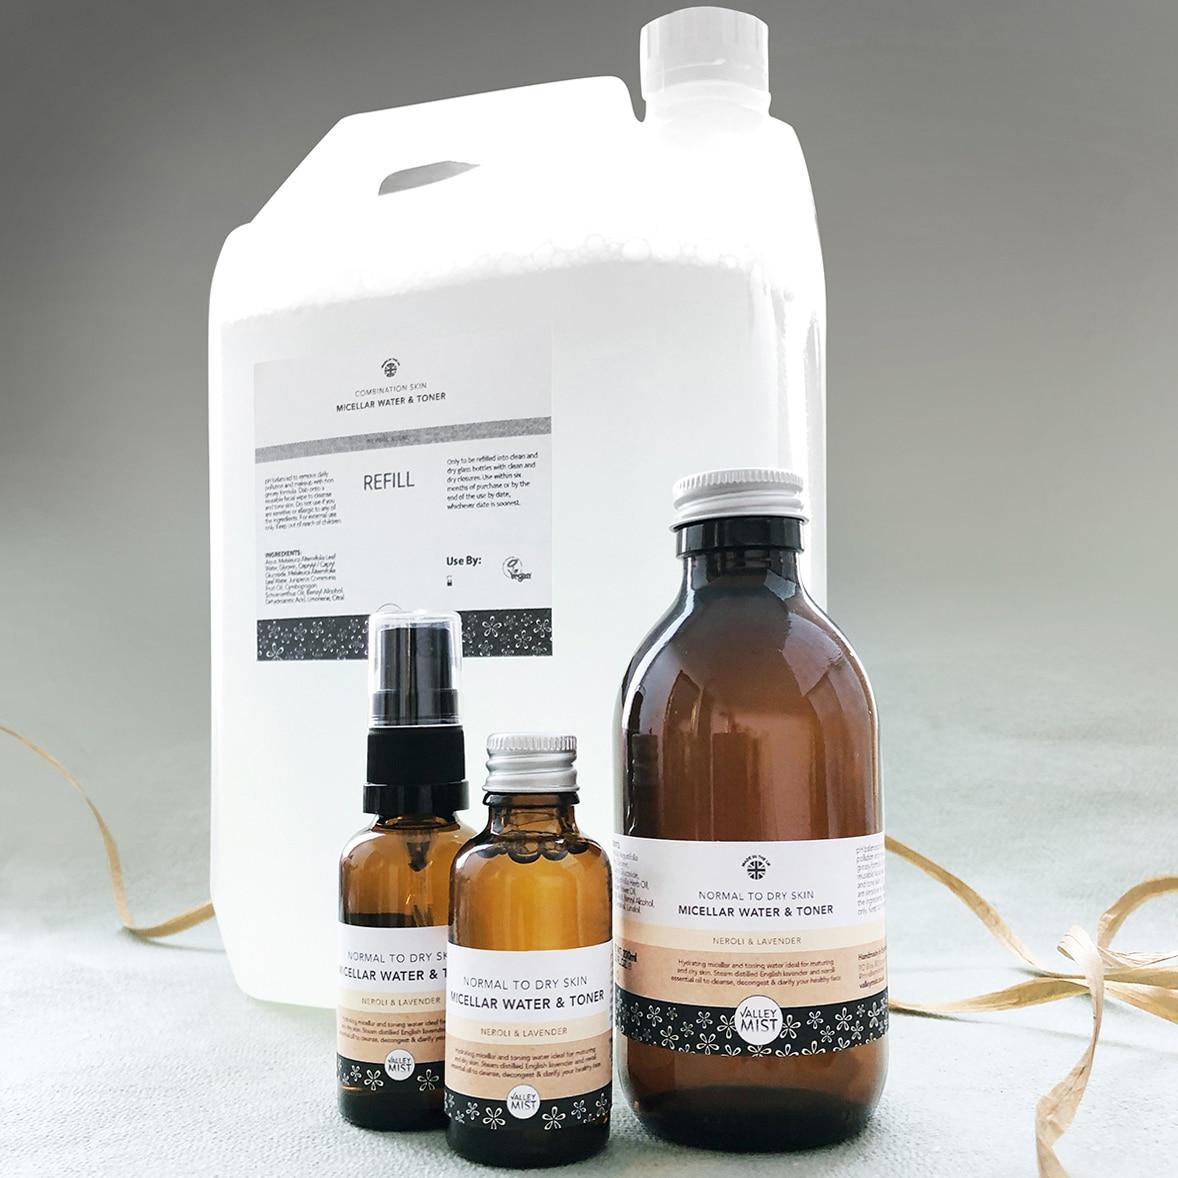 refill micellar water and toner